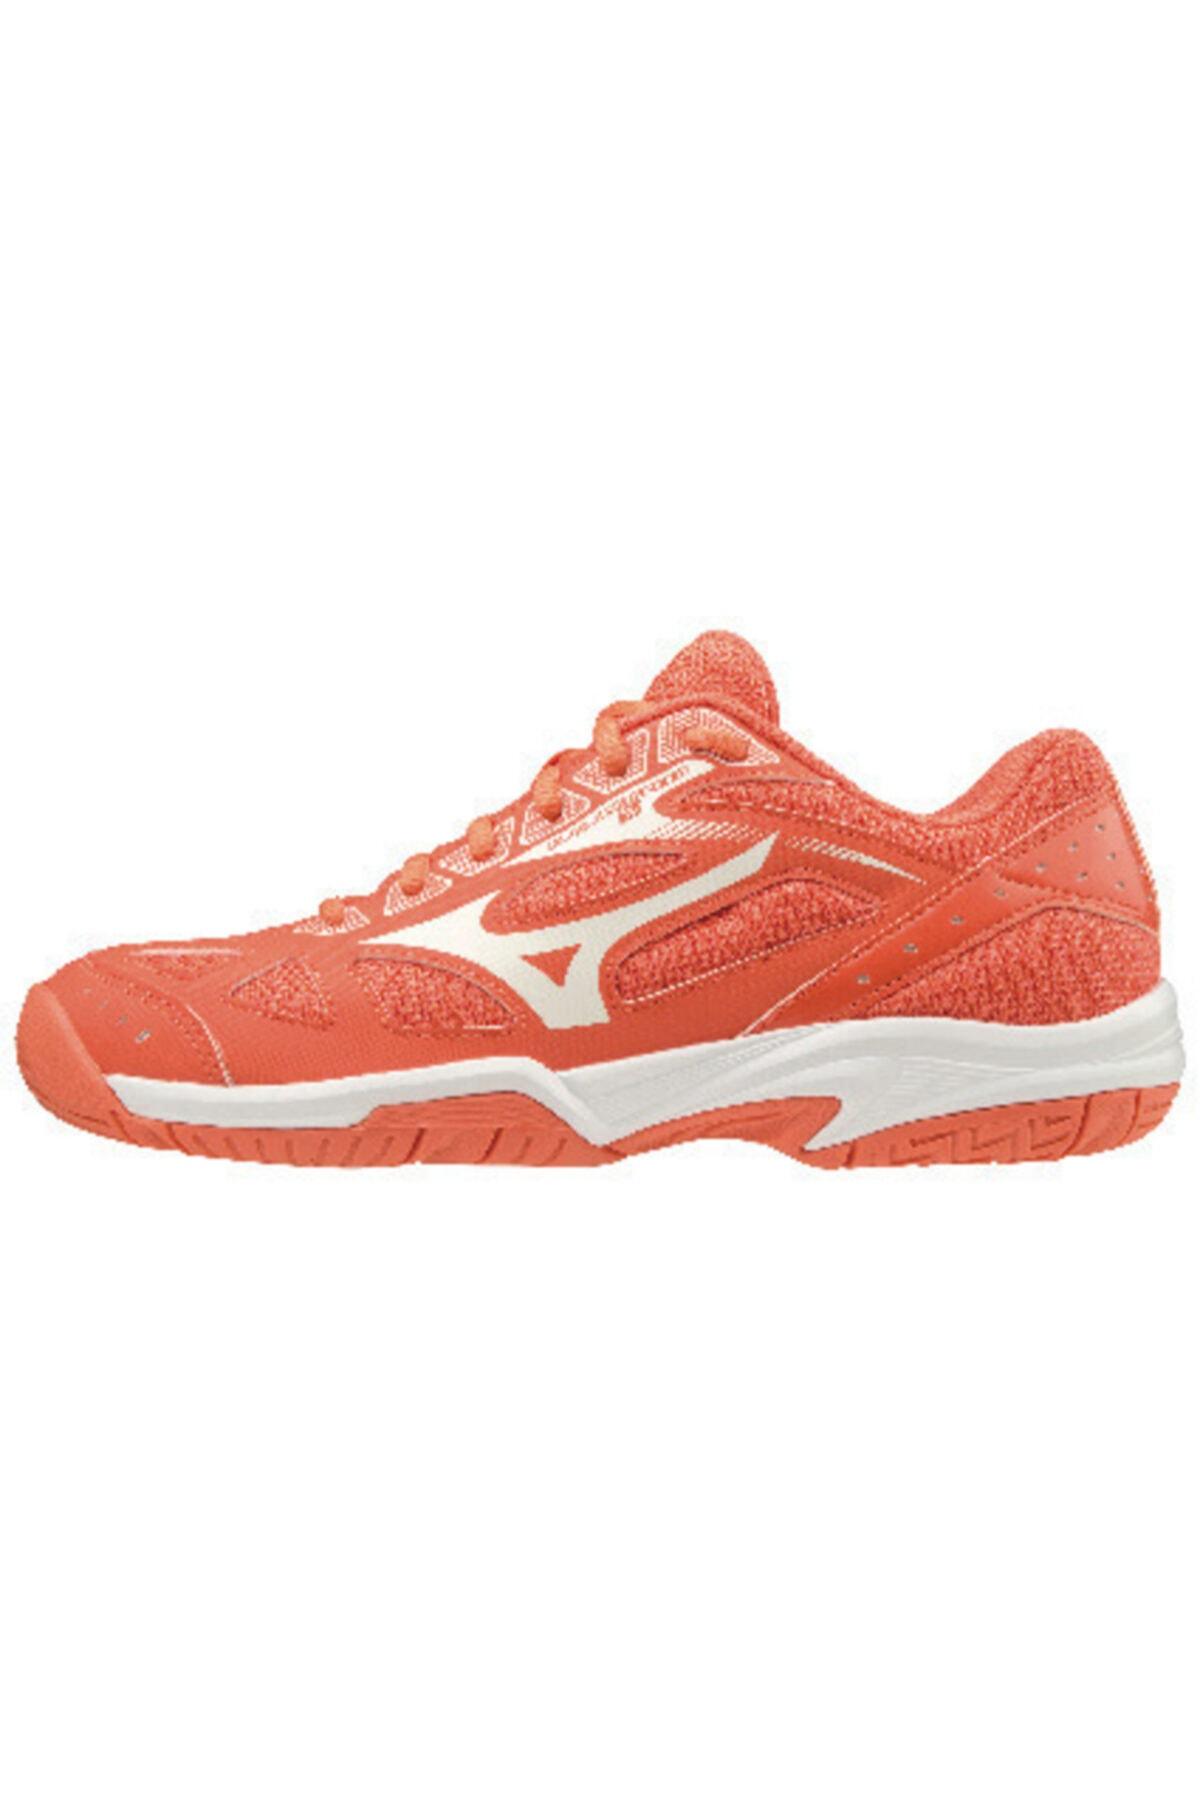 MIZUNO Cyclone Speed 2 Kadın Voleybol Ayakkabısı Pembe 1